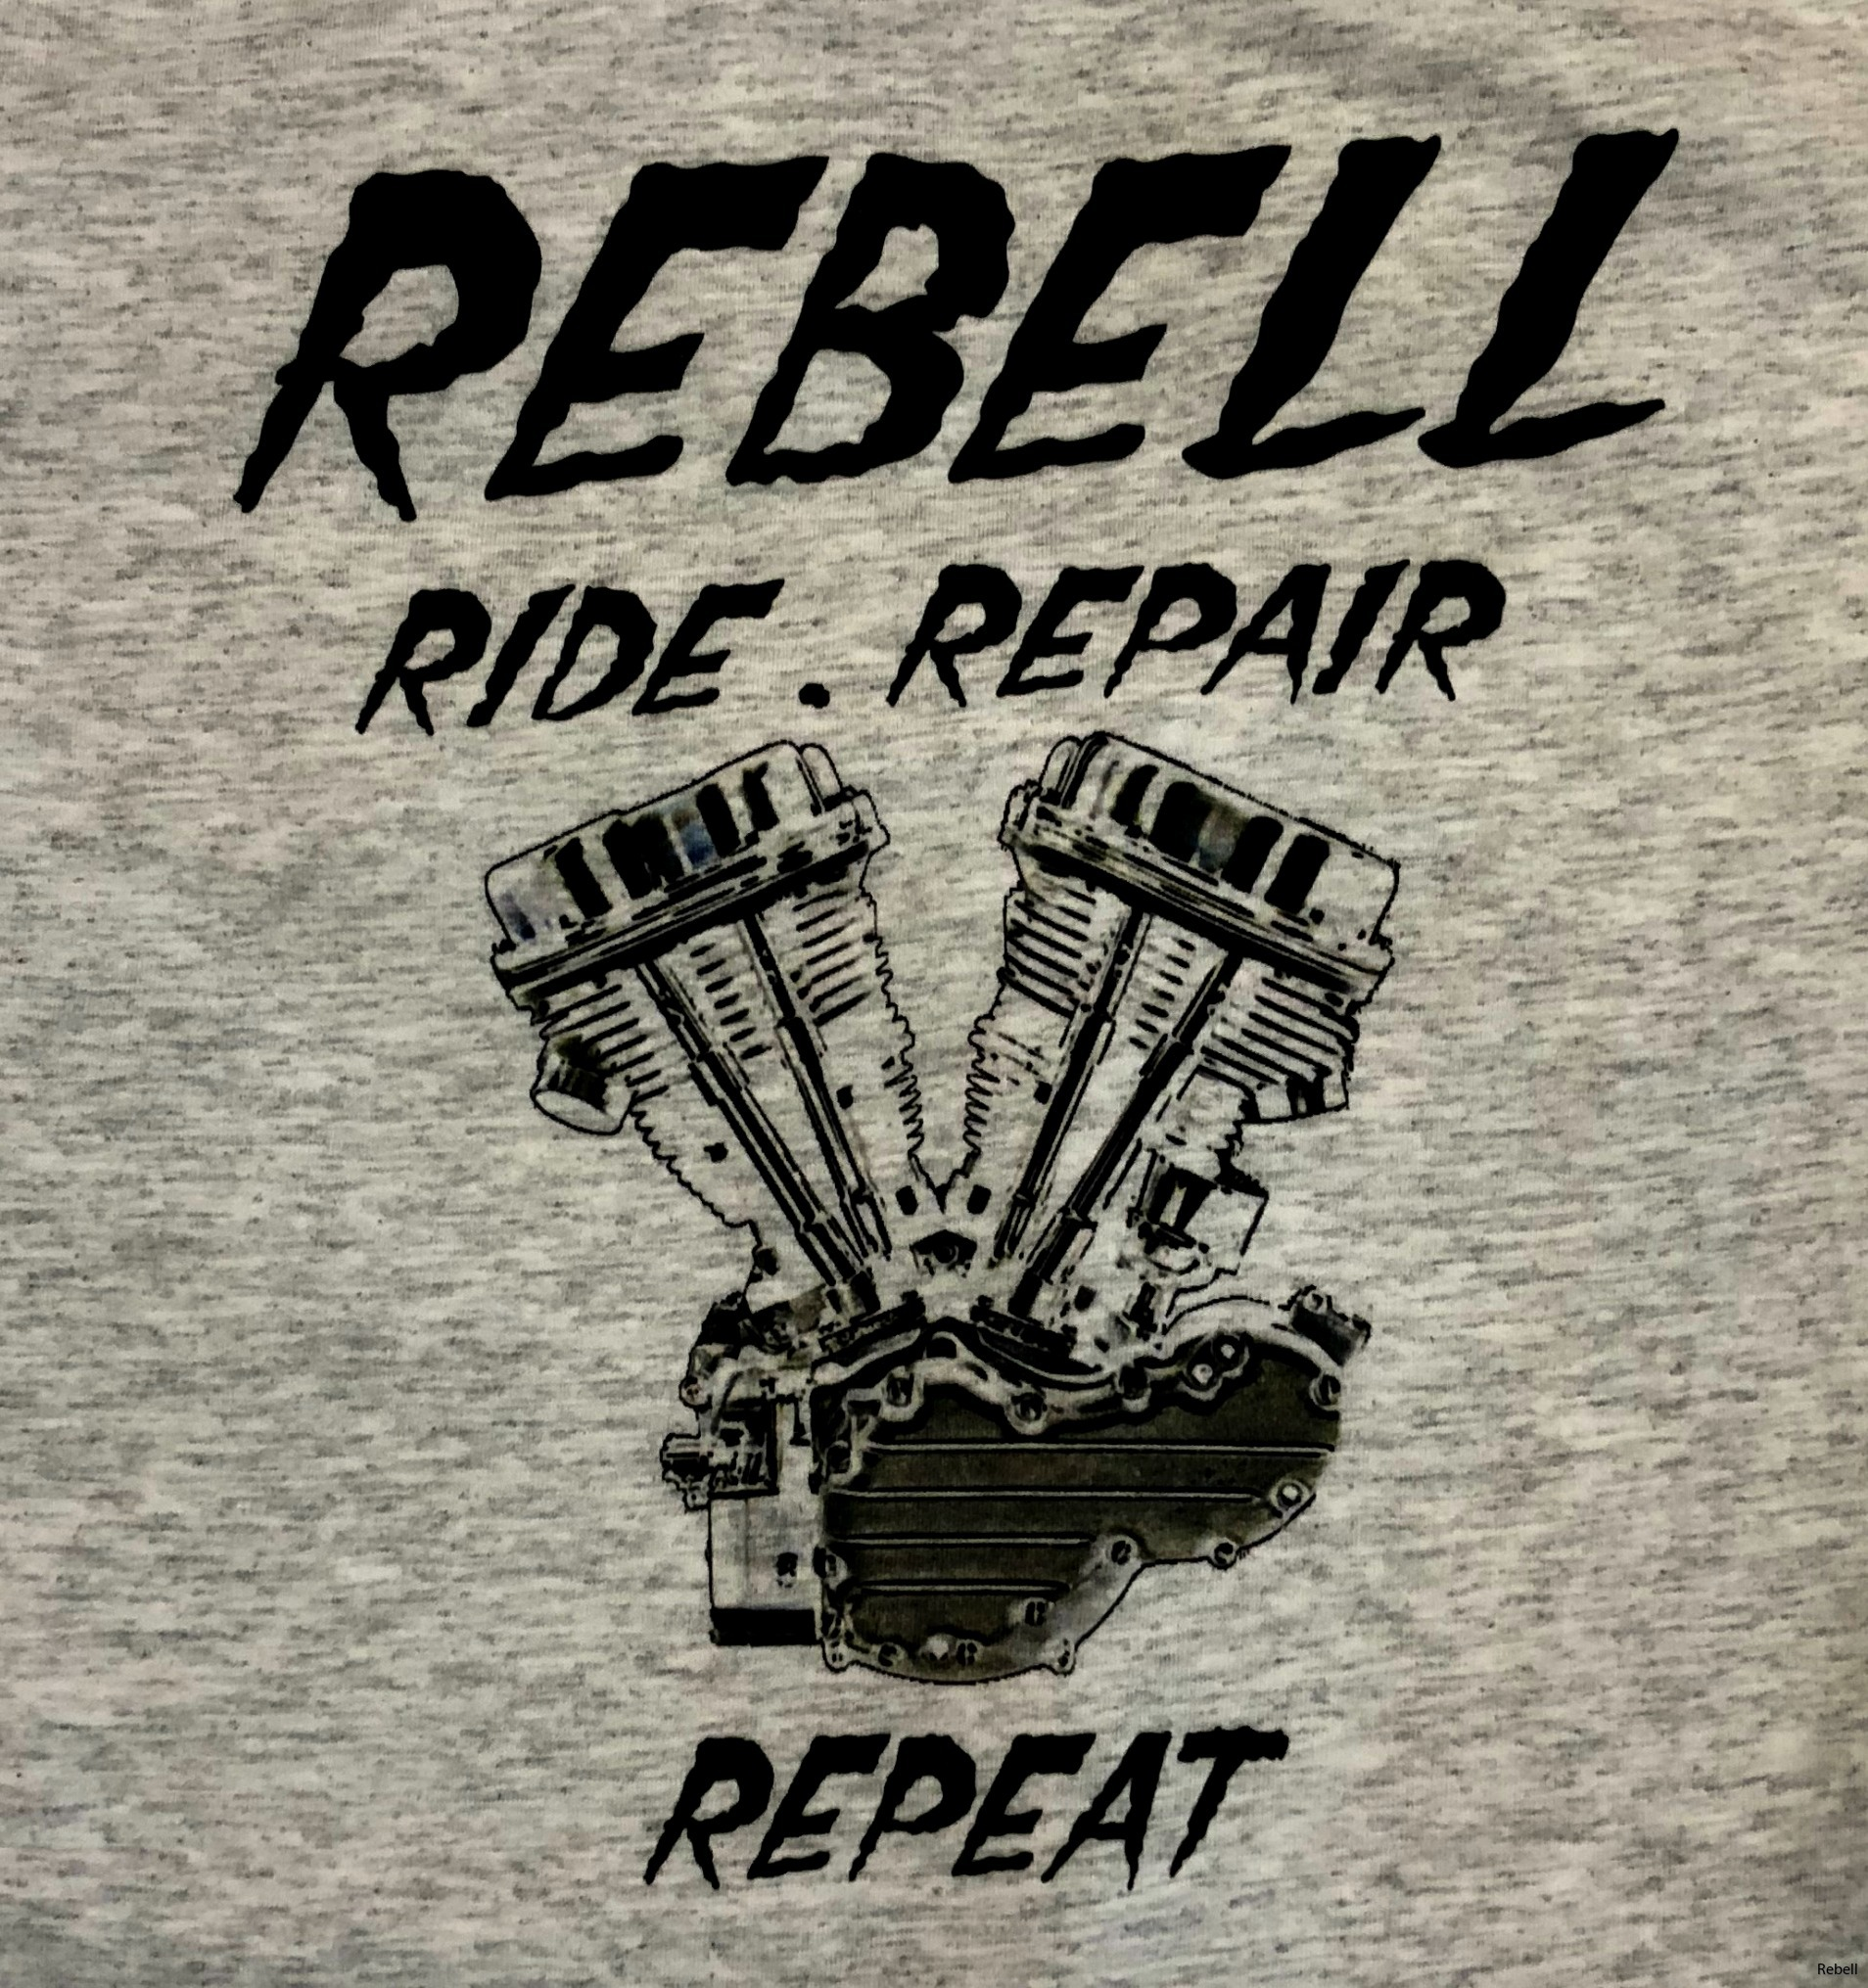 bomb rebell rebellclothes rebellskövde design tshirt rebelltshirt panheads panheads